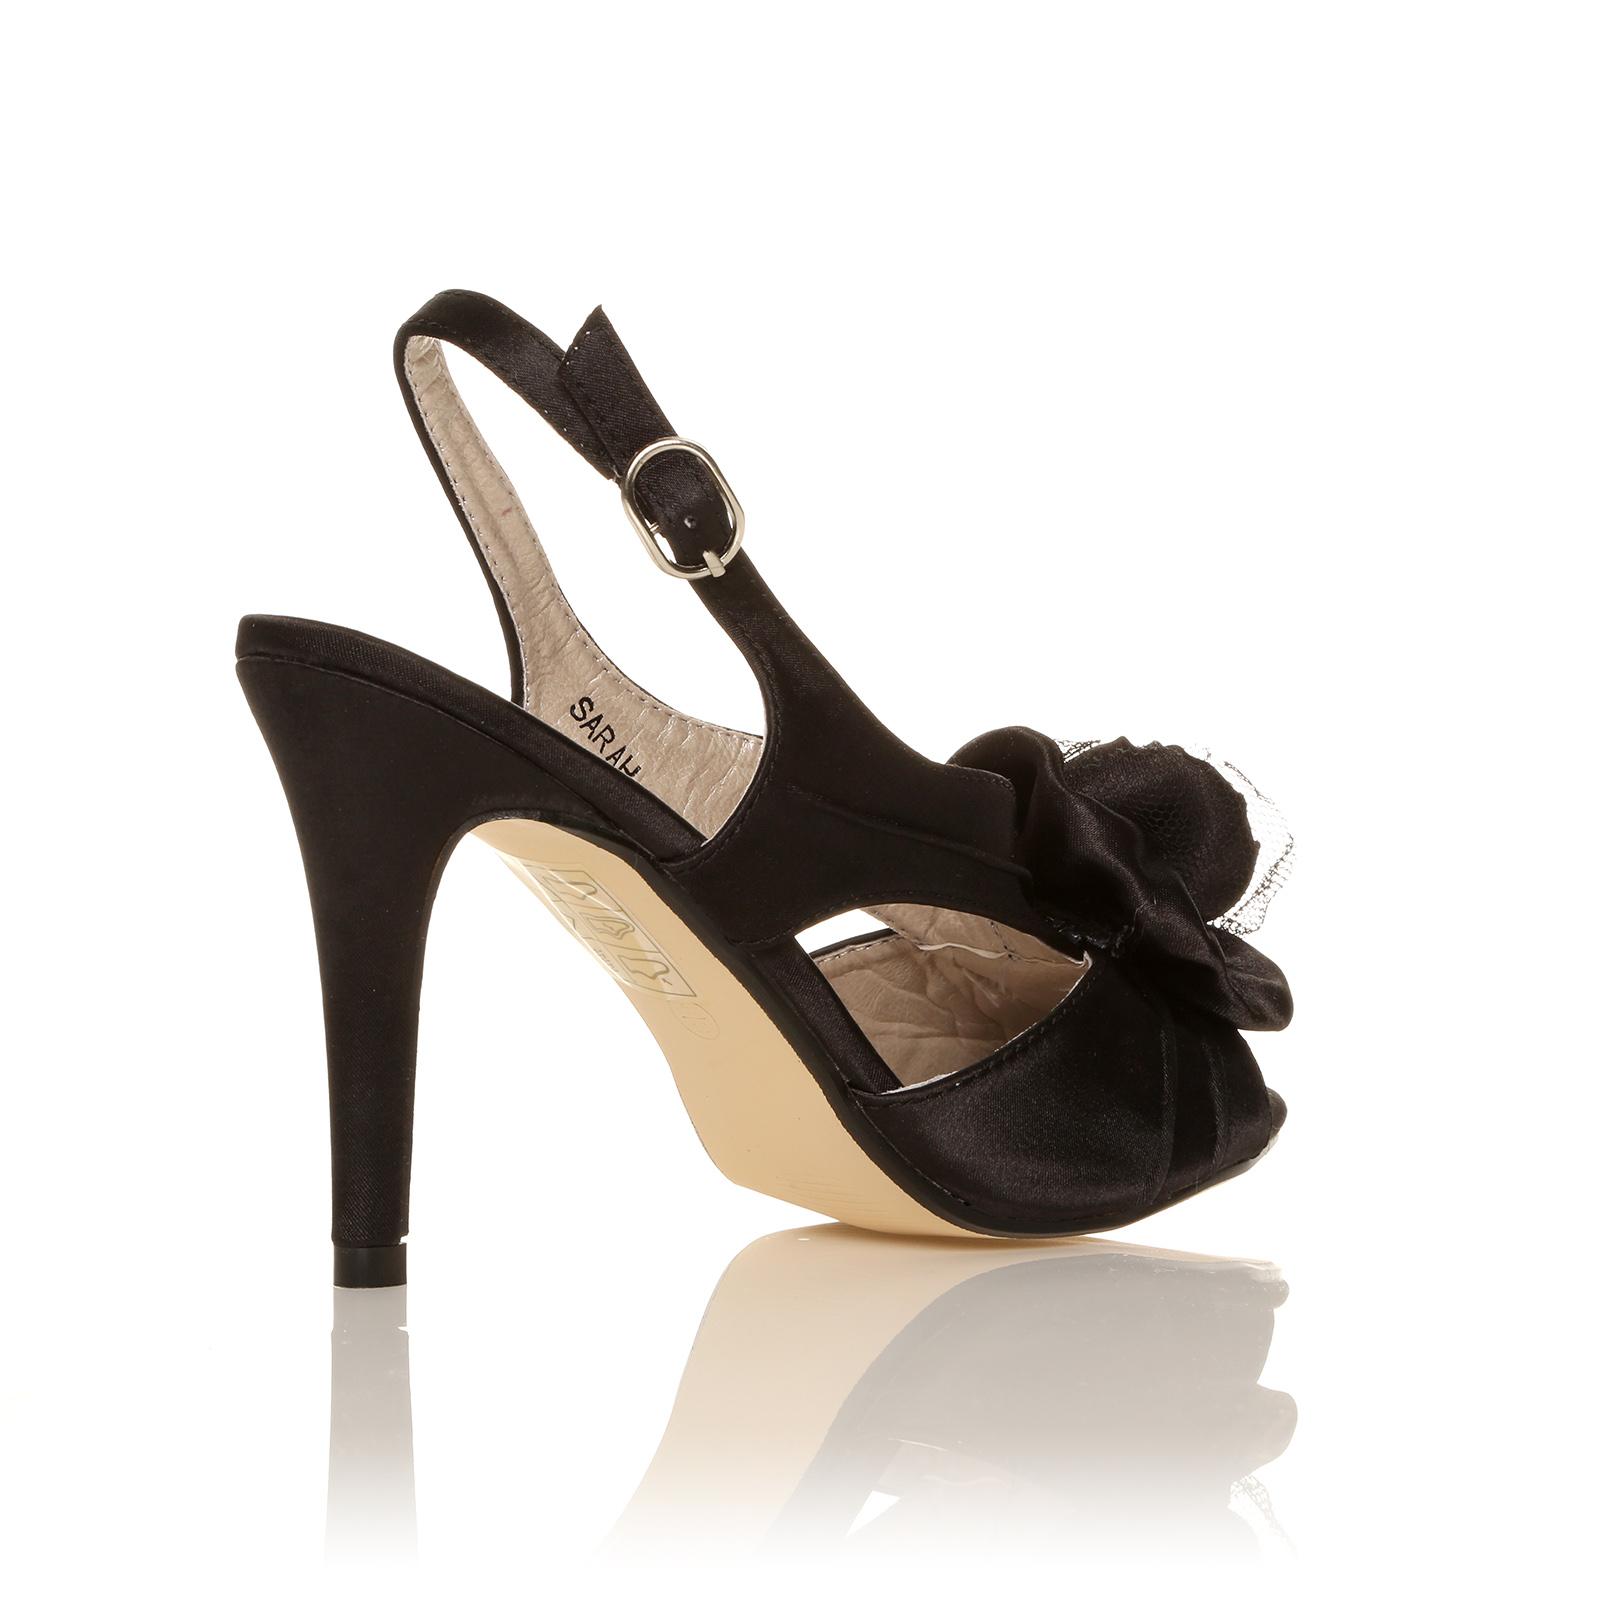 womens mid high heel sandals new wedding prom